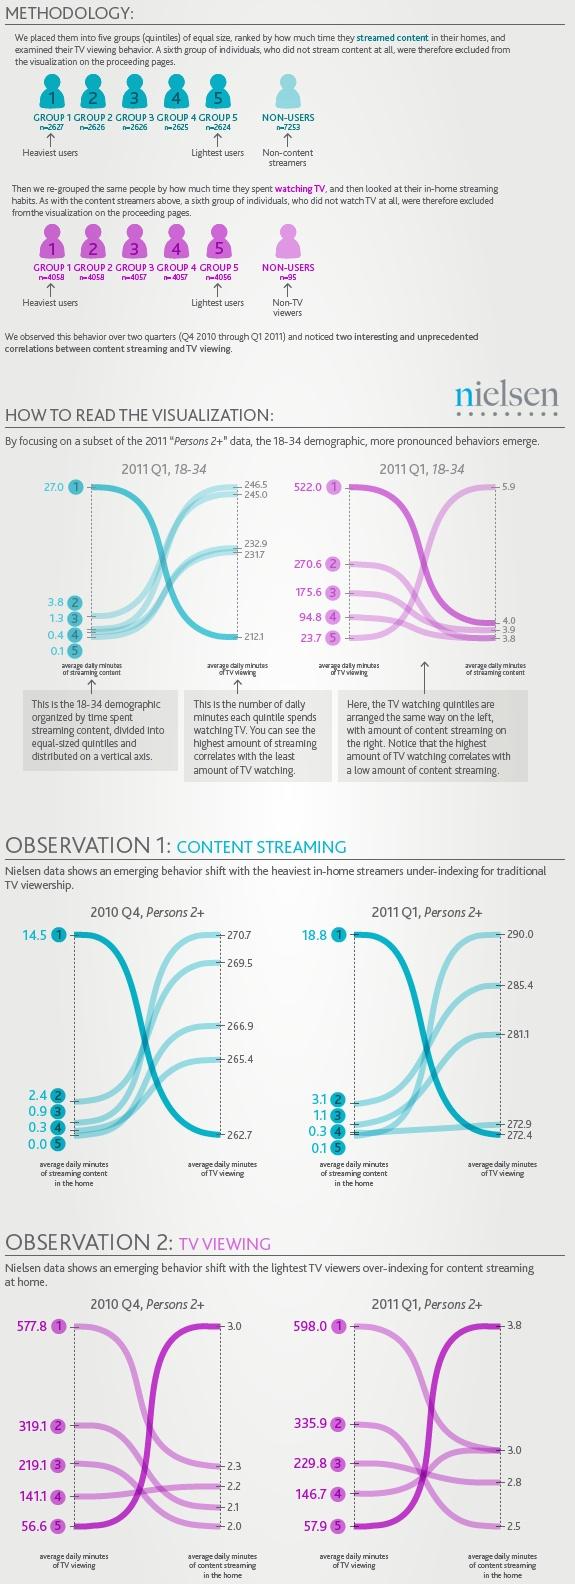 US Multiscreen Sonsumption Patterns : TV VS Web VS Mobile